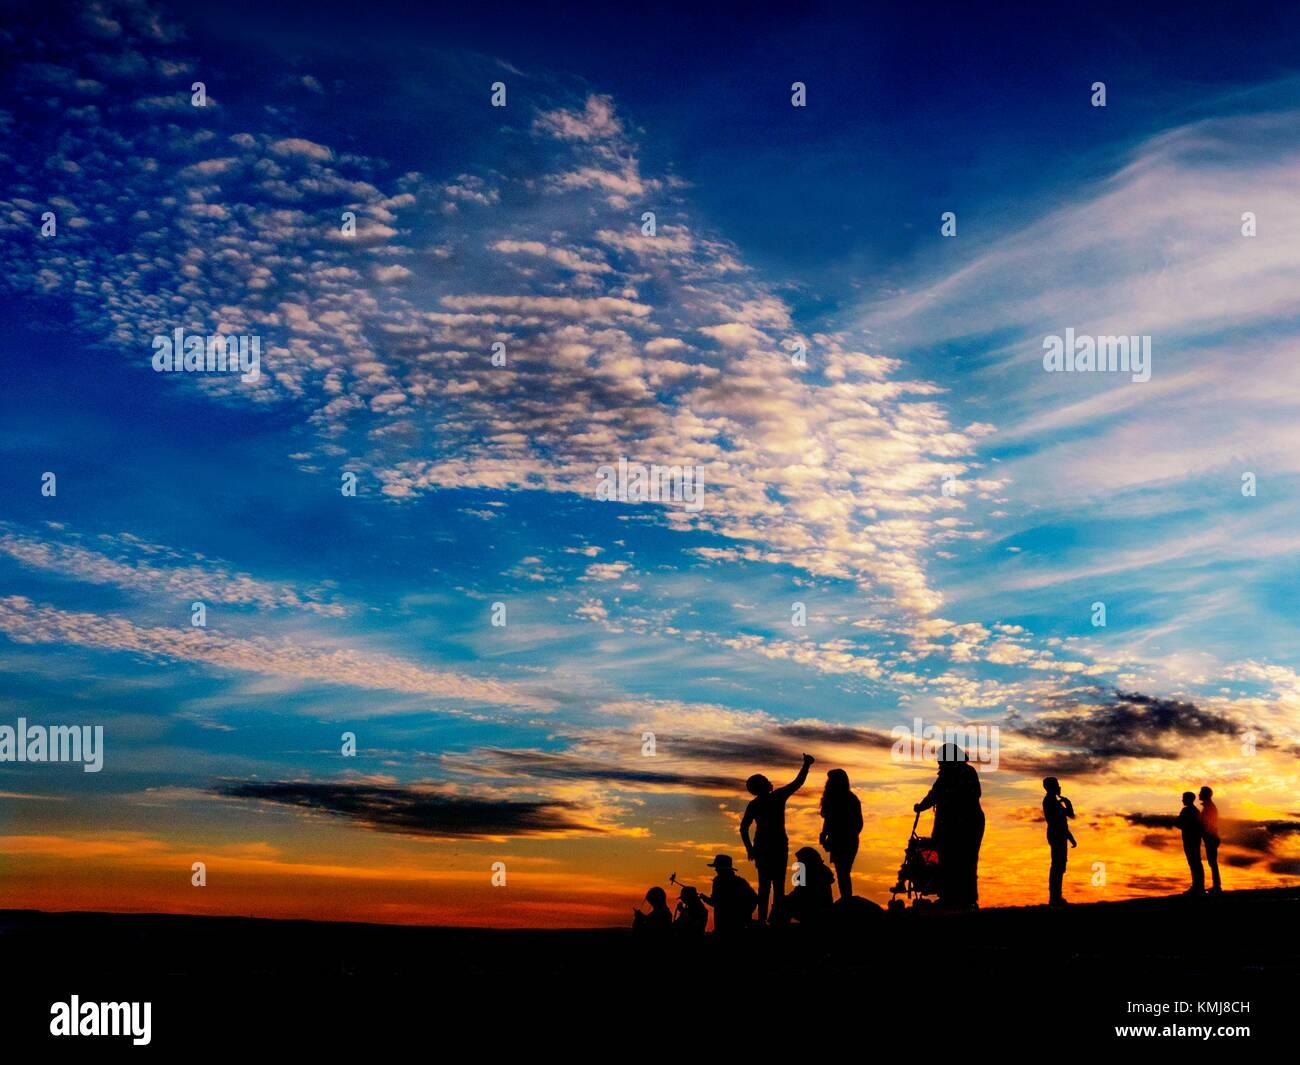 Silhouetten bei Sonnenuntergang. Marokko Stockbild